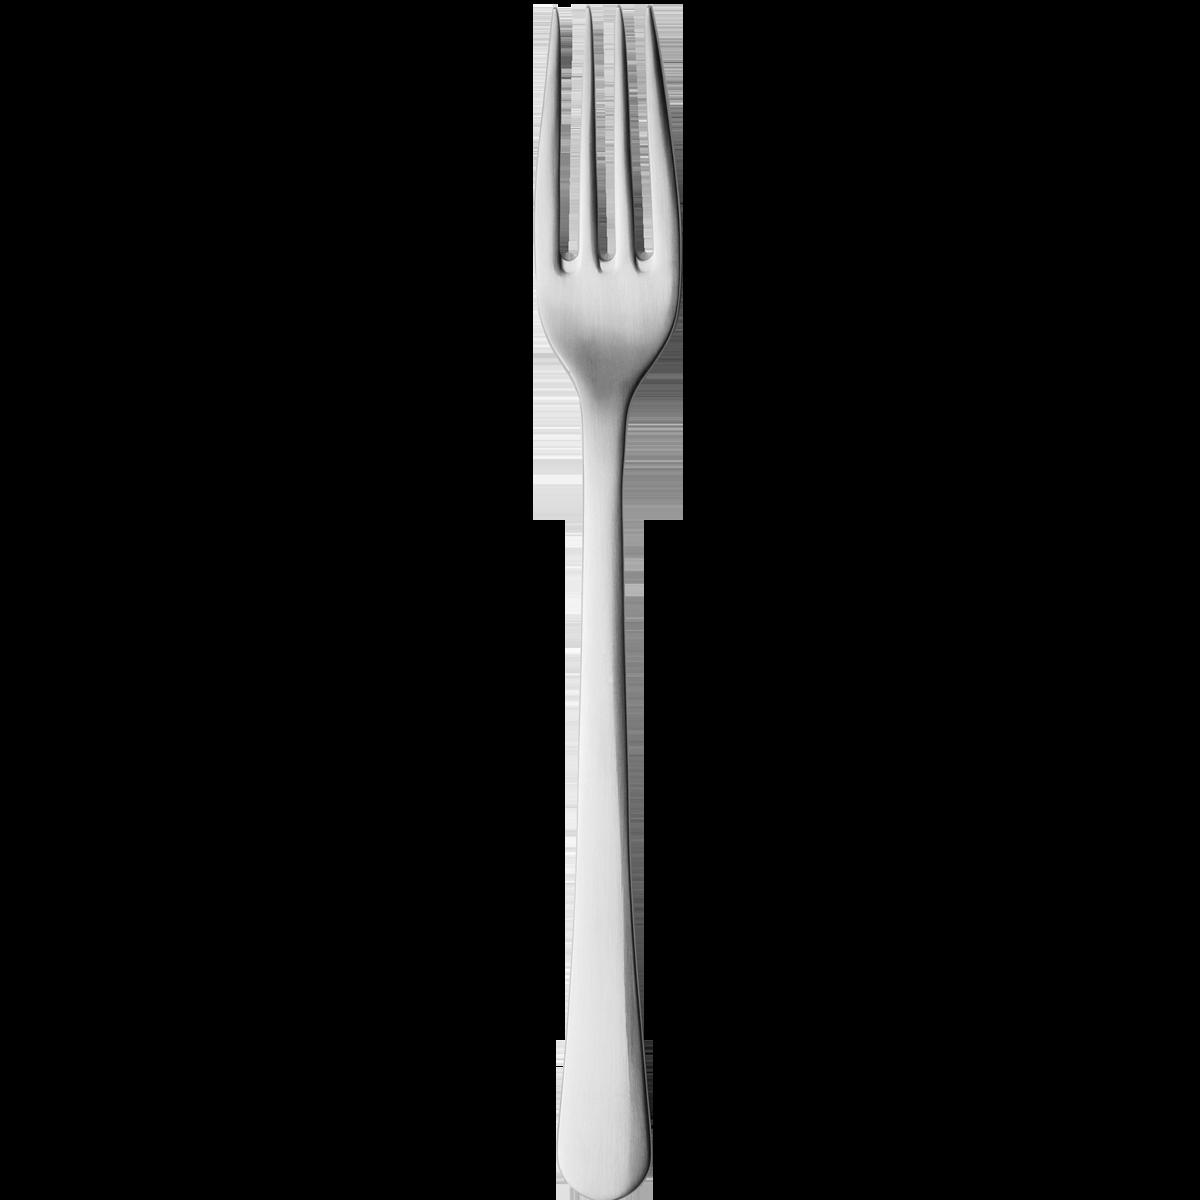 Forks PNG images, free fork picture download